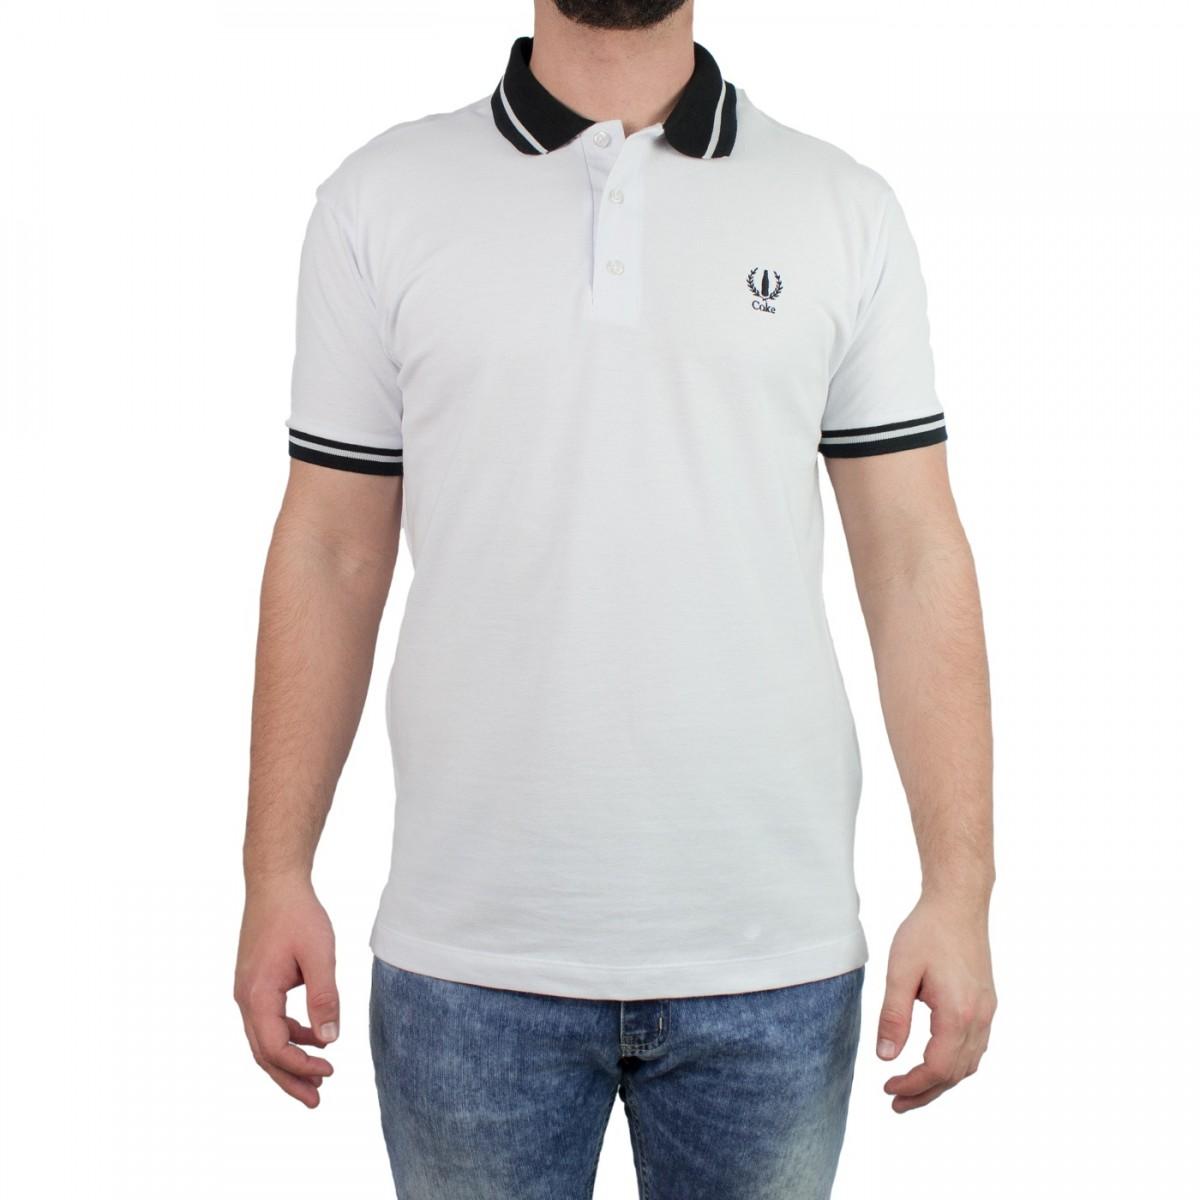 Bizz Store - Camisa Polo Masculina Coca-Cola Branca Manga Curta 68d118a640d3d